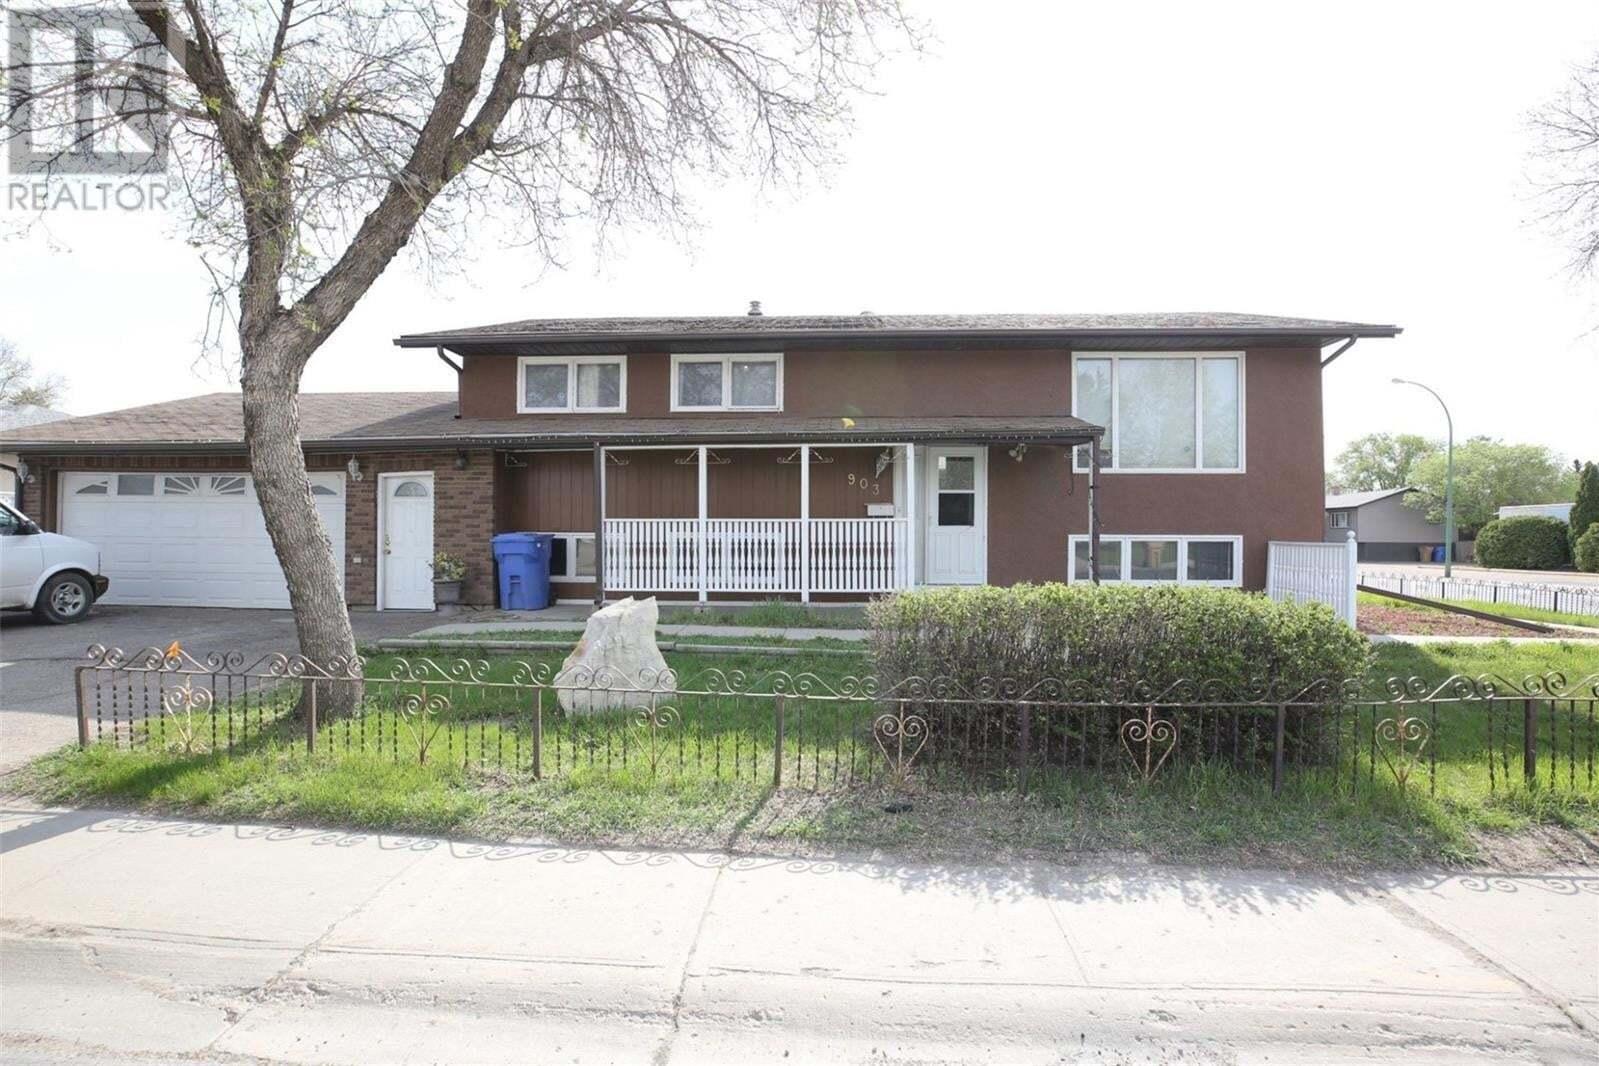 House for sale at 903 Broad St N Regina Saskatchewan - MLS: SK809505